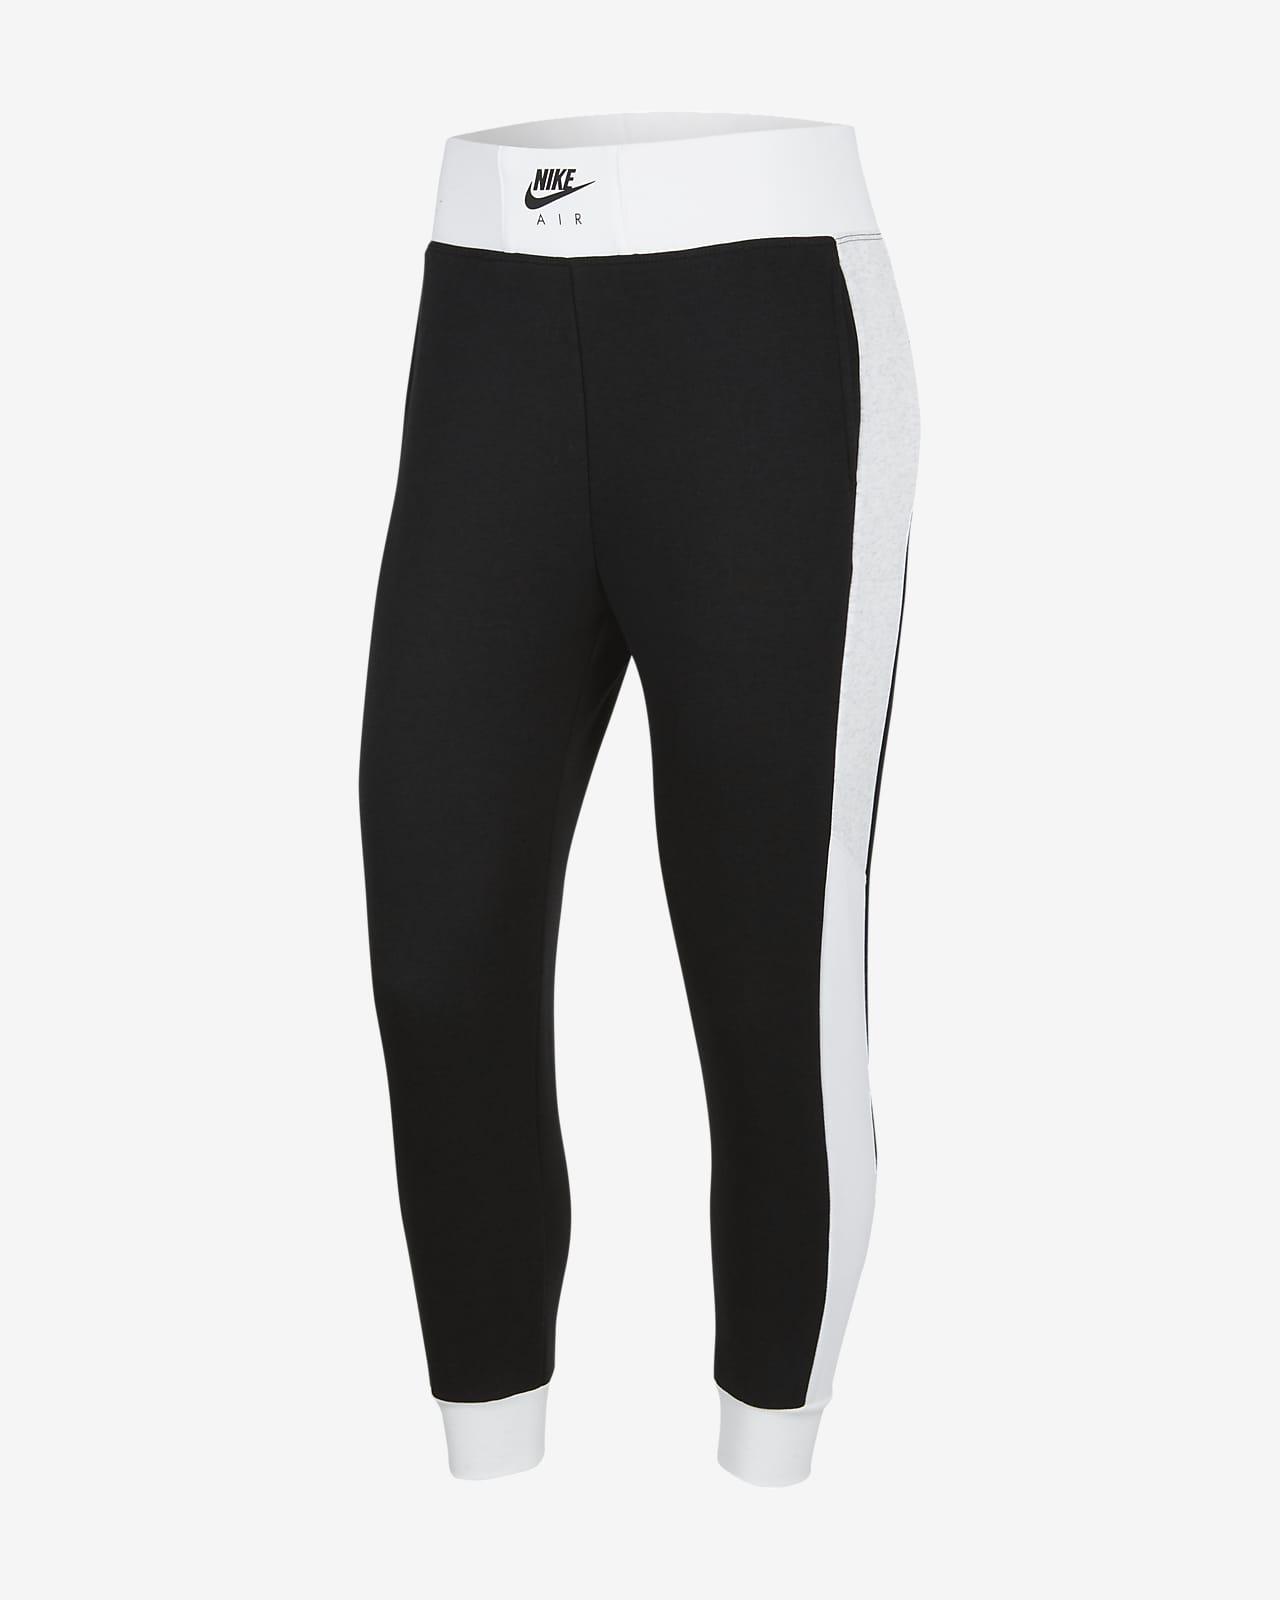 Nike Air 女子长裤